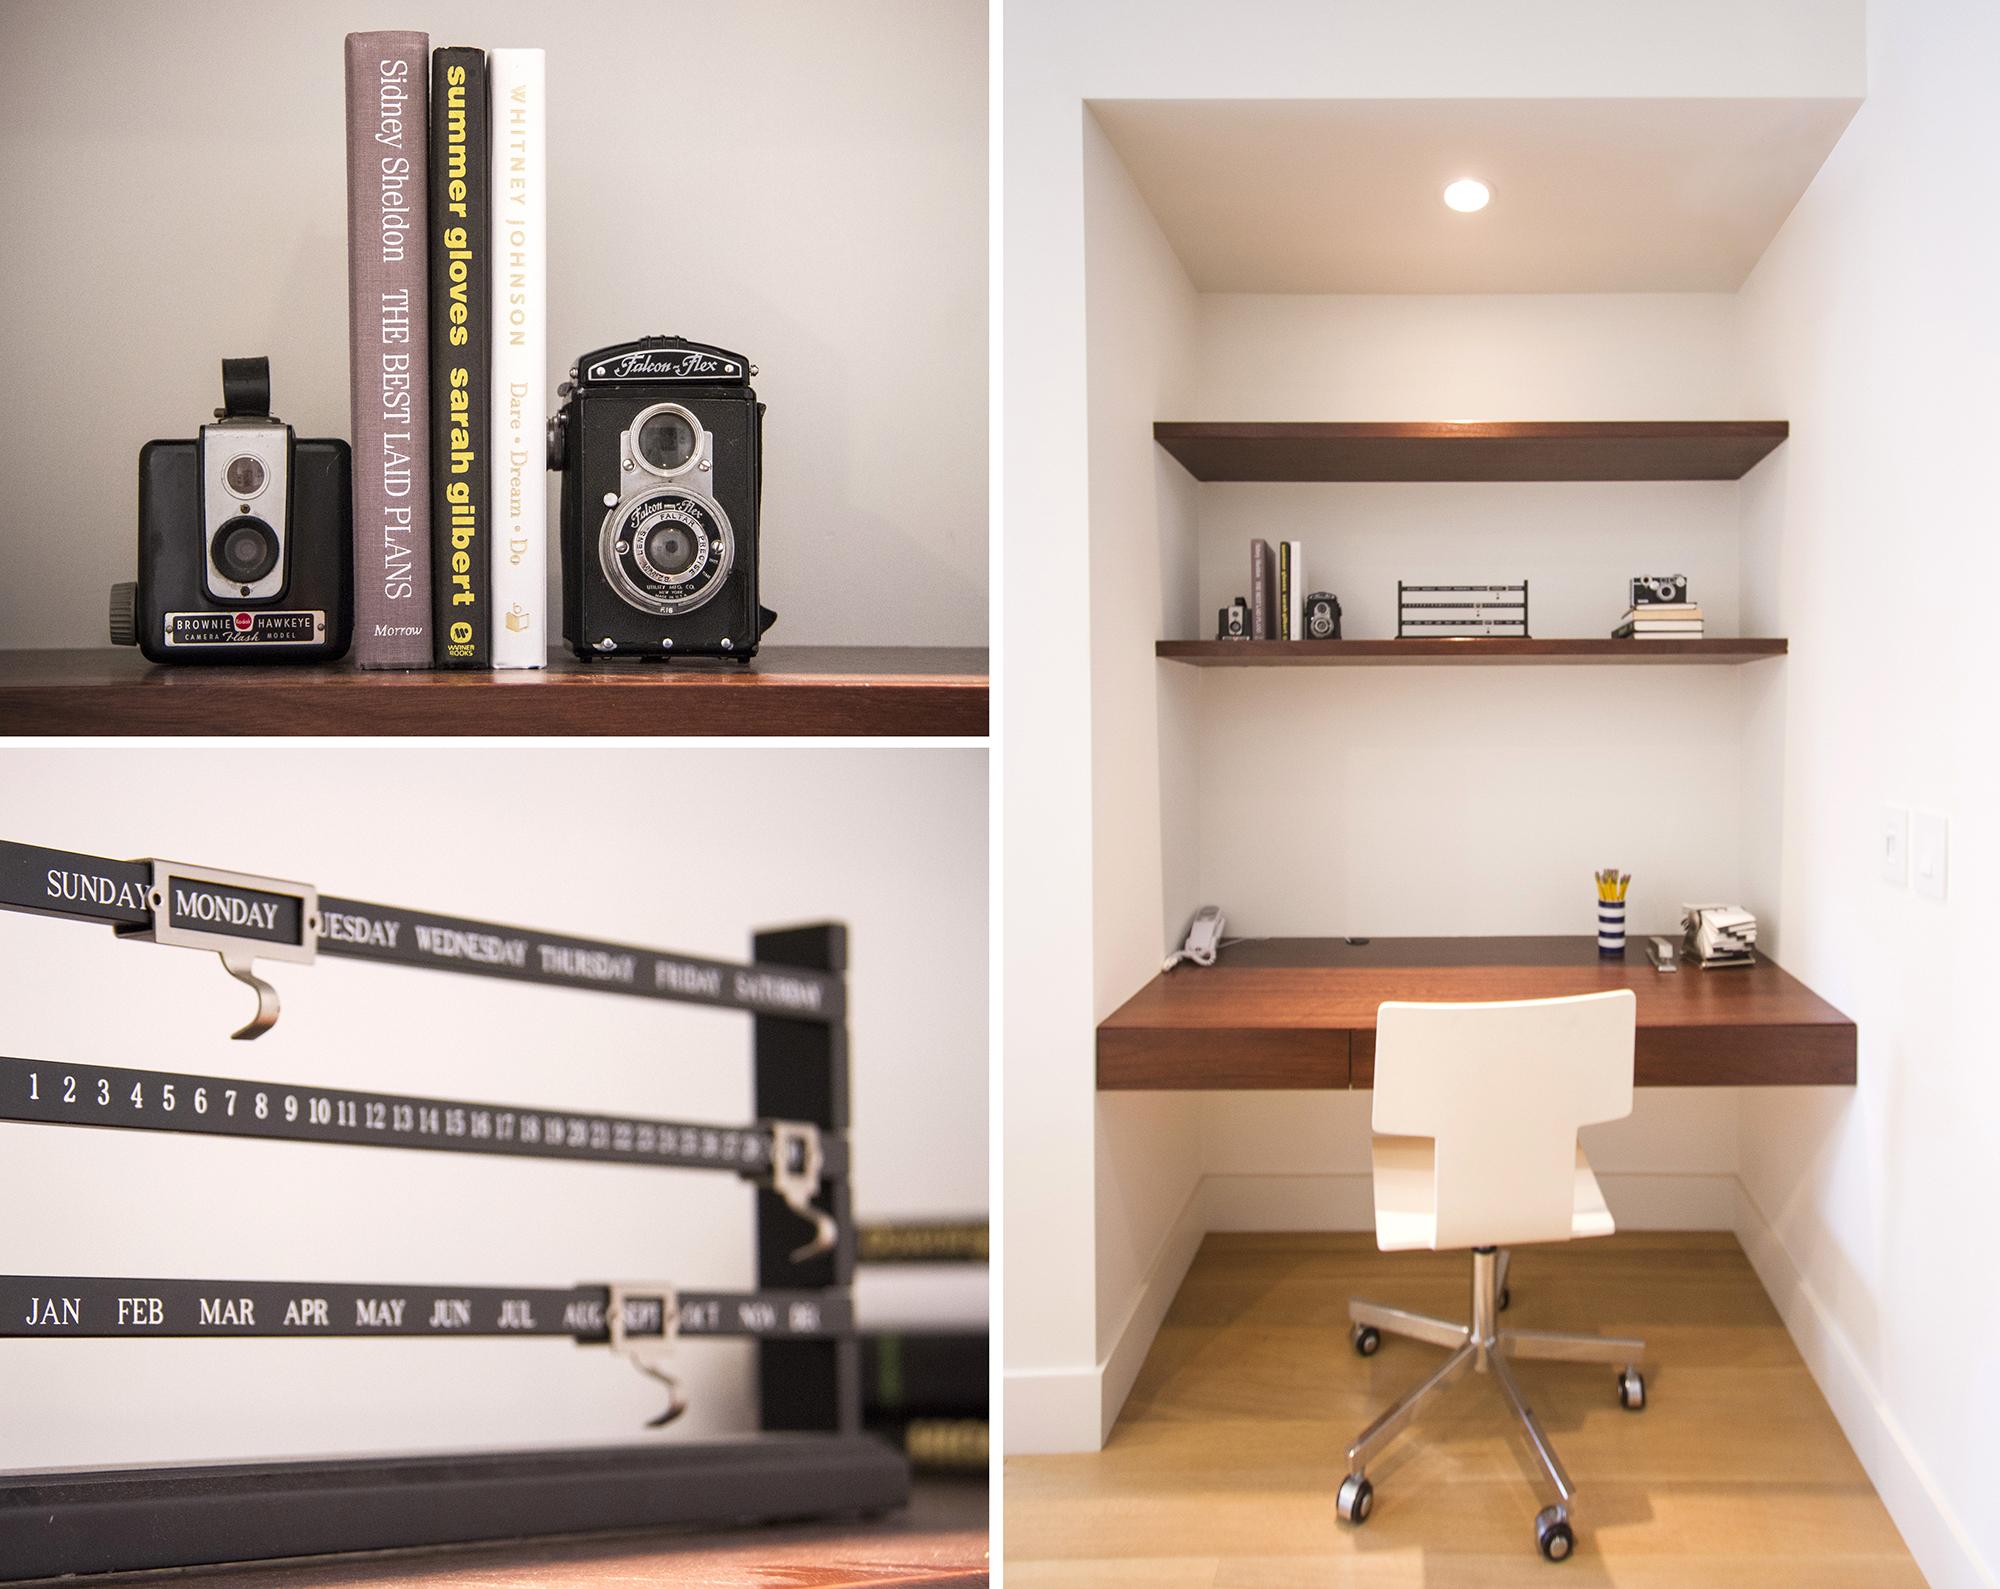 details, decor, decorate, desk, style, luxury, office